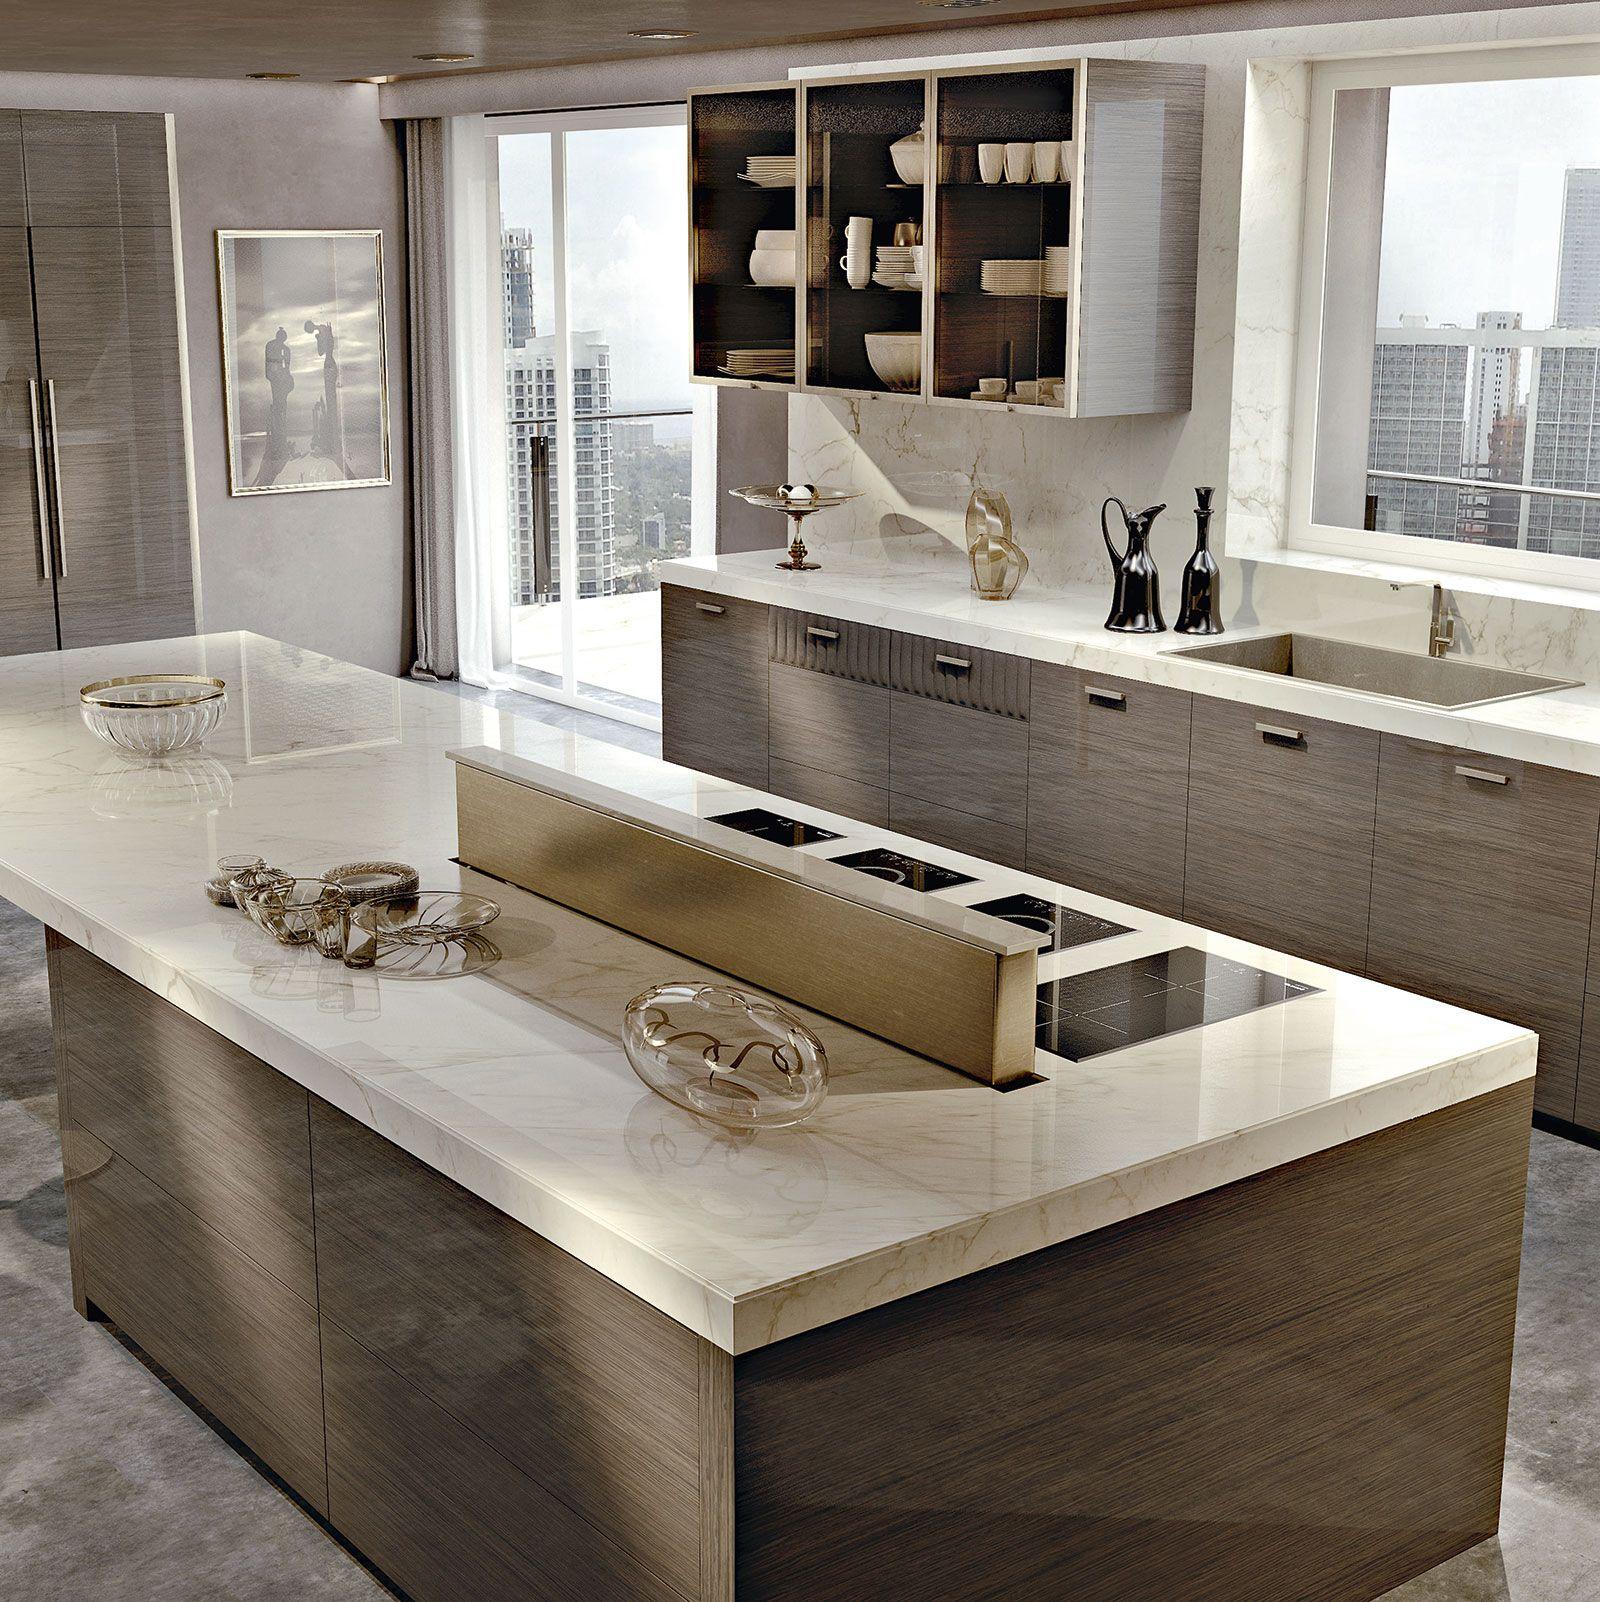 Daytona arredamento contemporaneo moderno di lusso e for Casa stile moderno